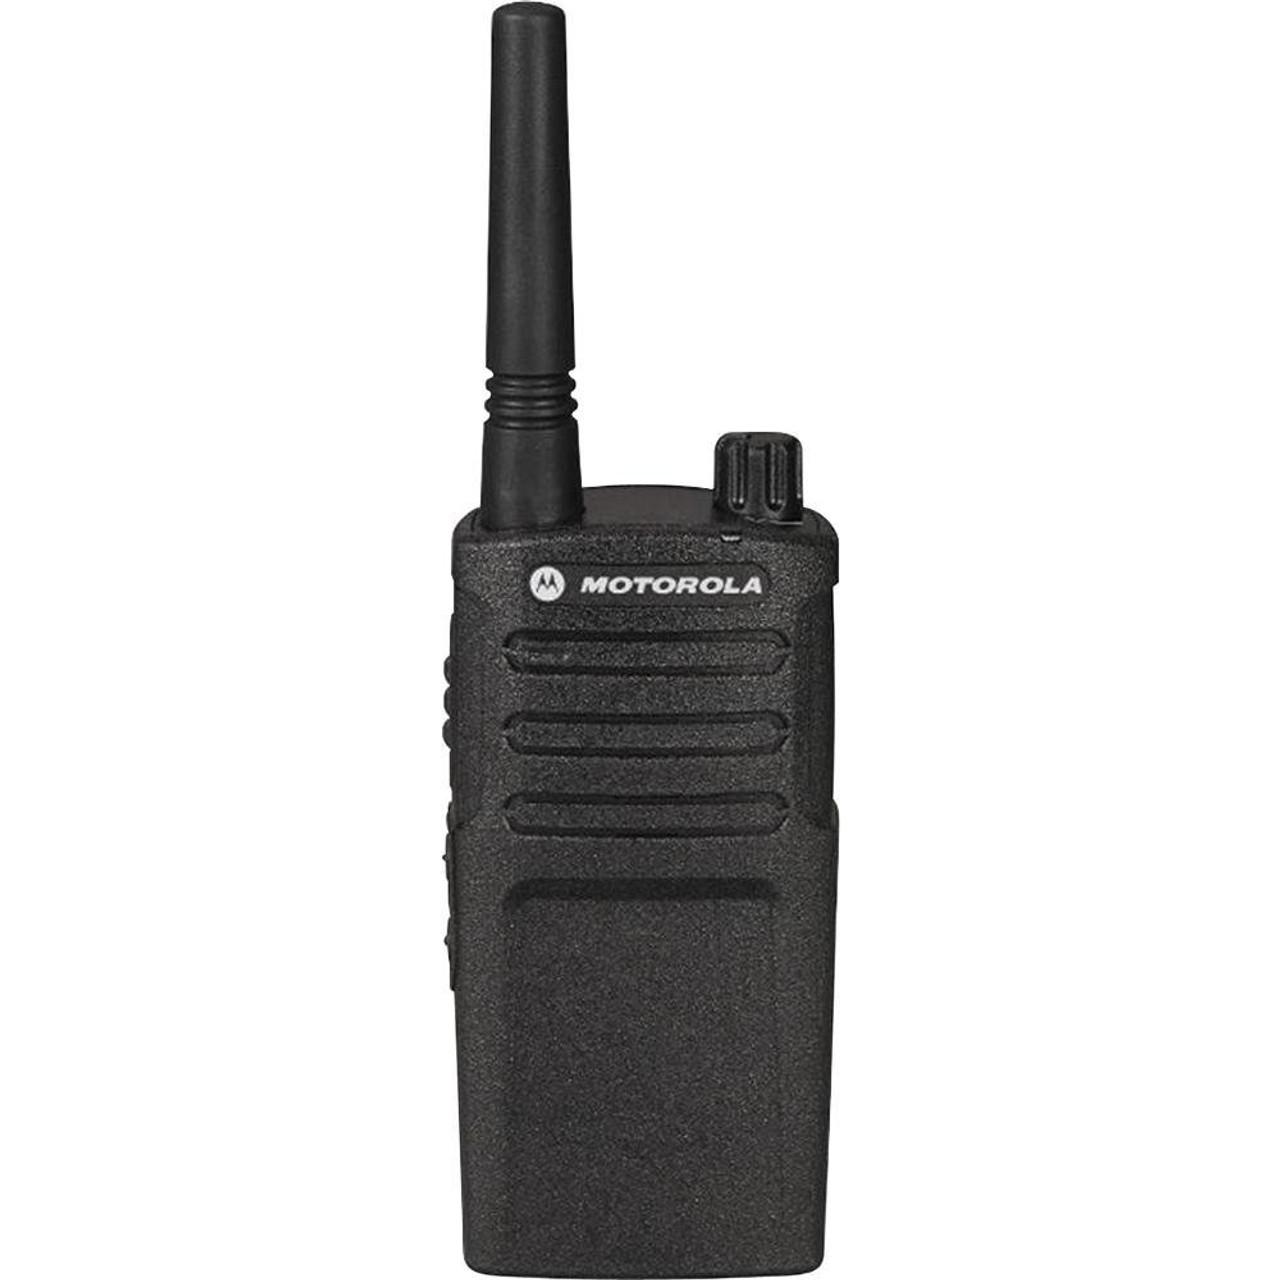 Motorola RMM2050 2 Watt MURS two way radio